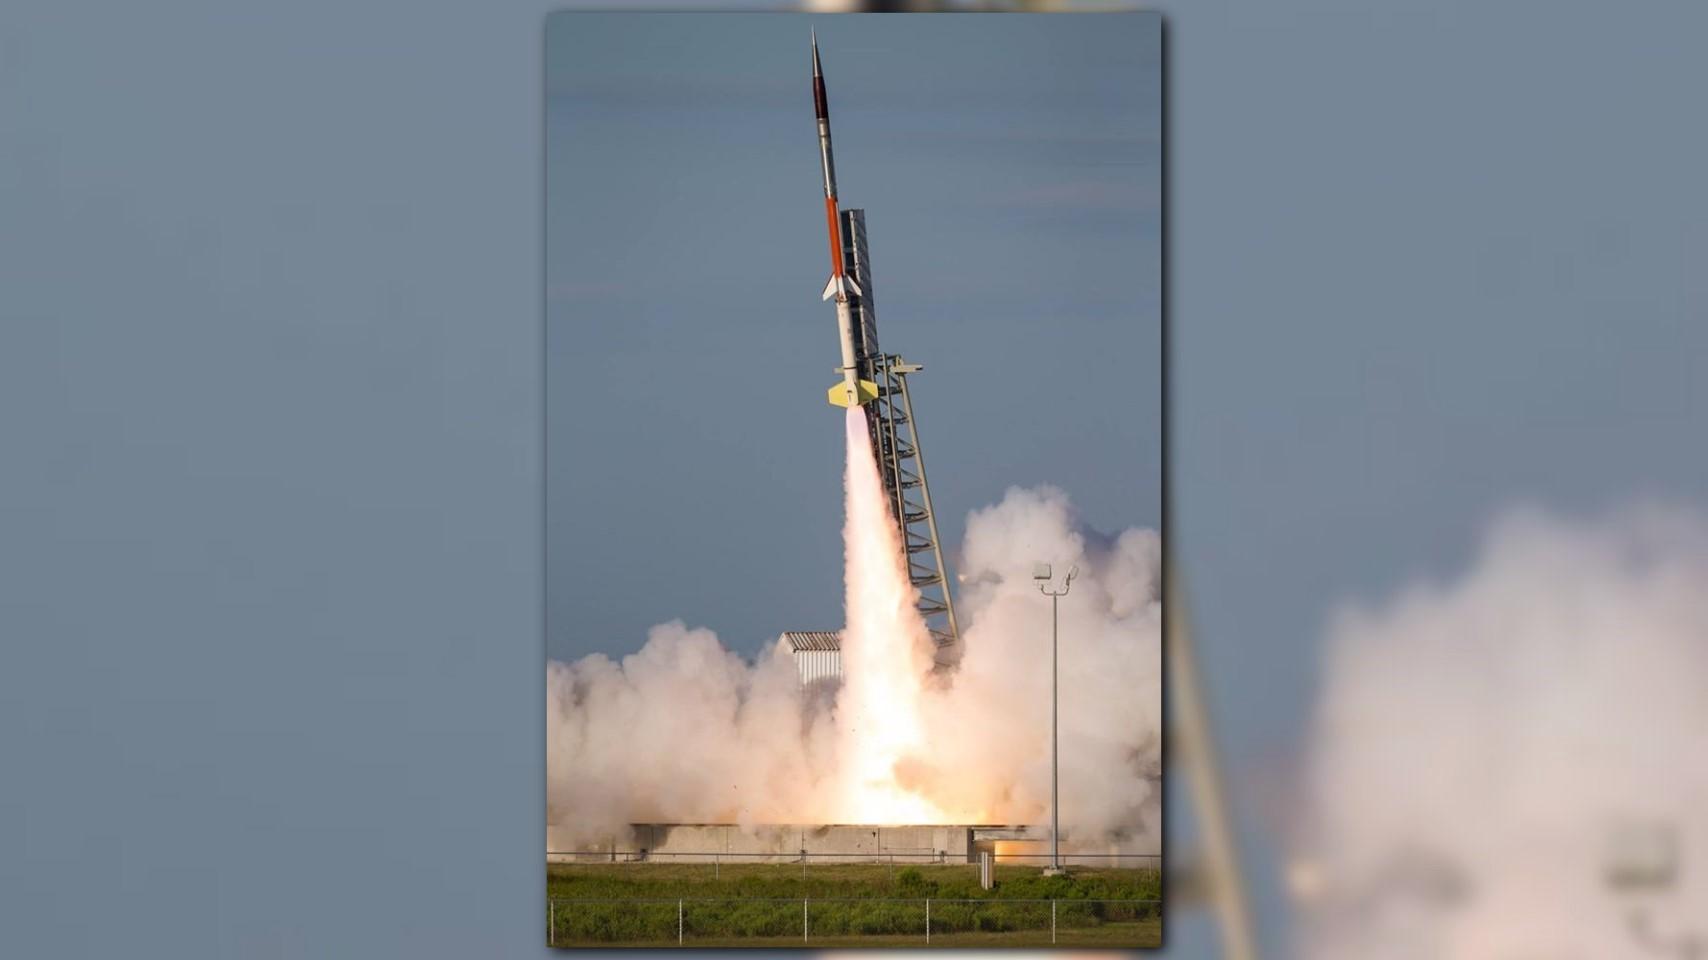 nasa wallops rocket launch - photo #18